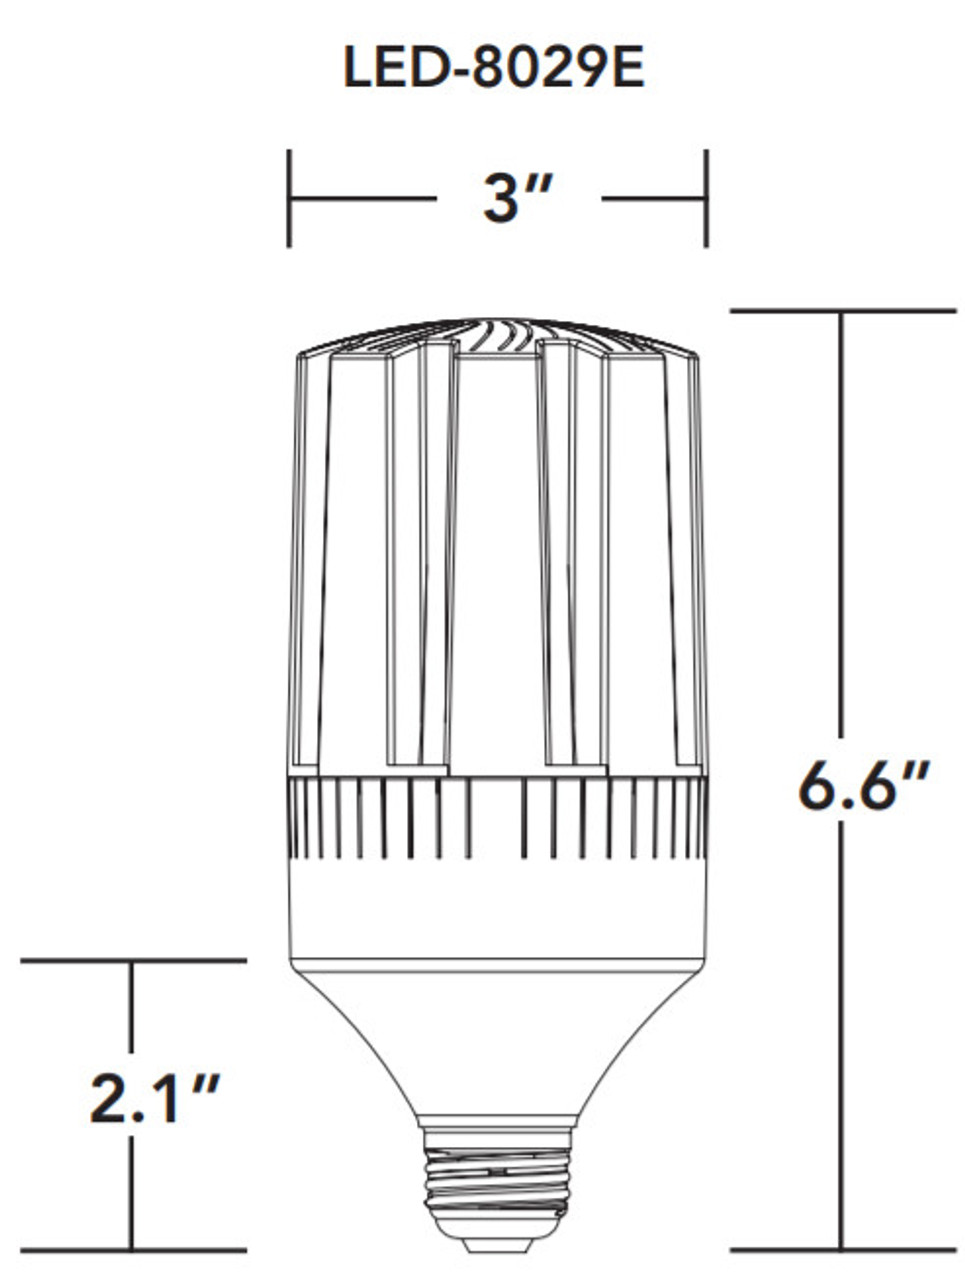 LED-8029E-A 24W, 360° Bollard LED Retrofit